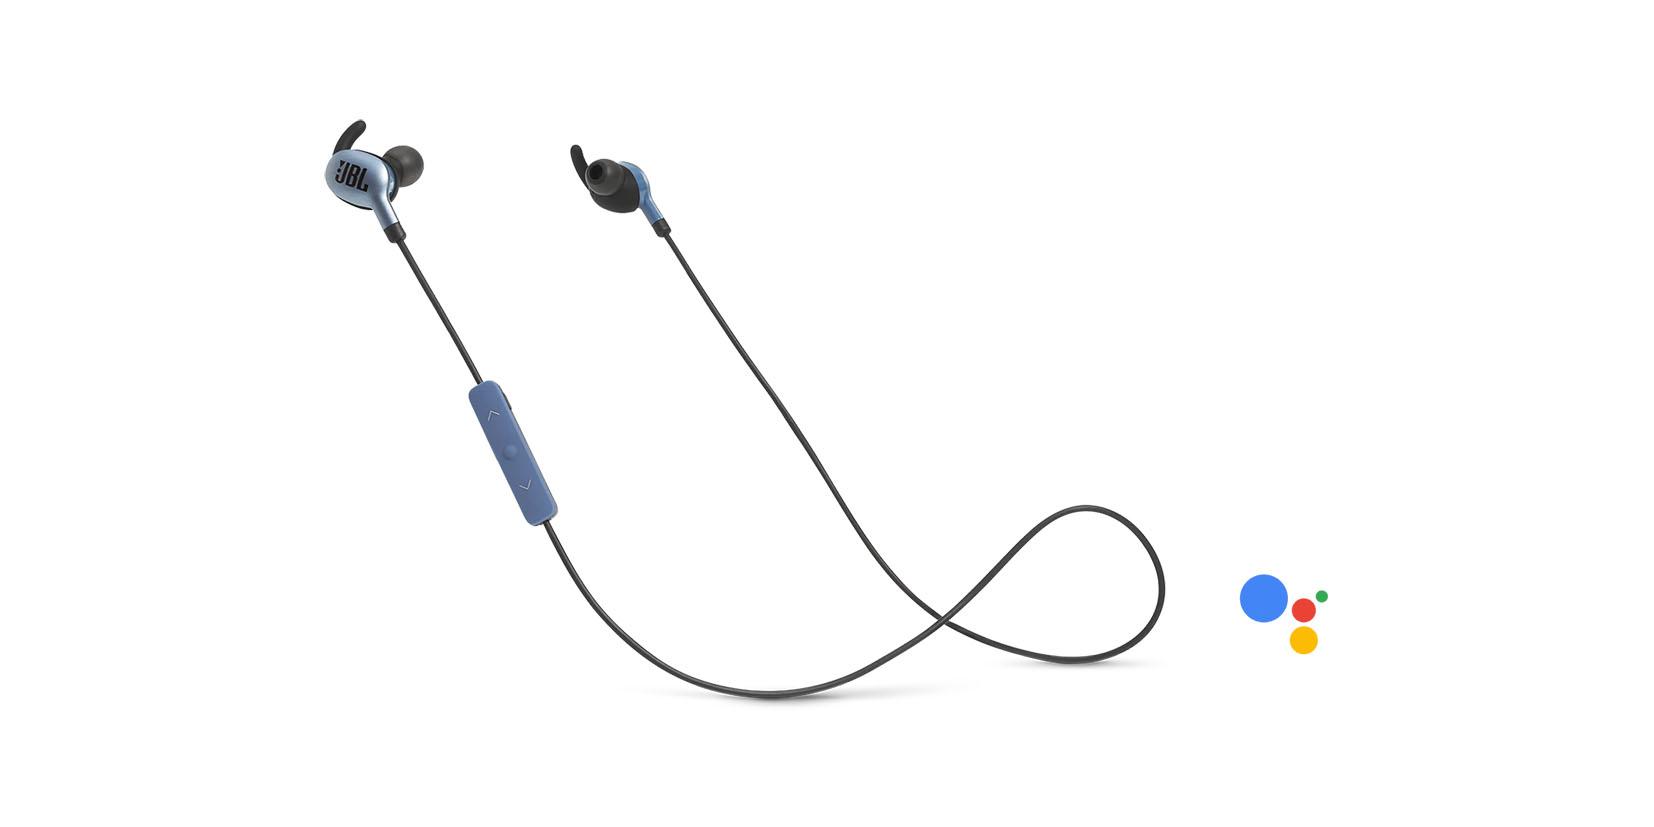 Sony wireless headphones around neck - sony headphones earbuds wireless